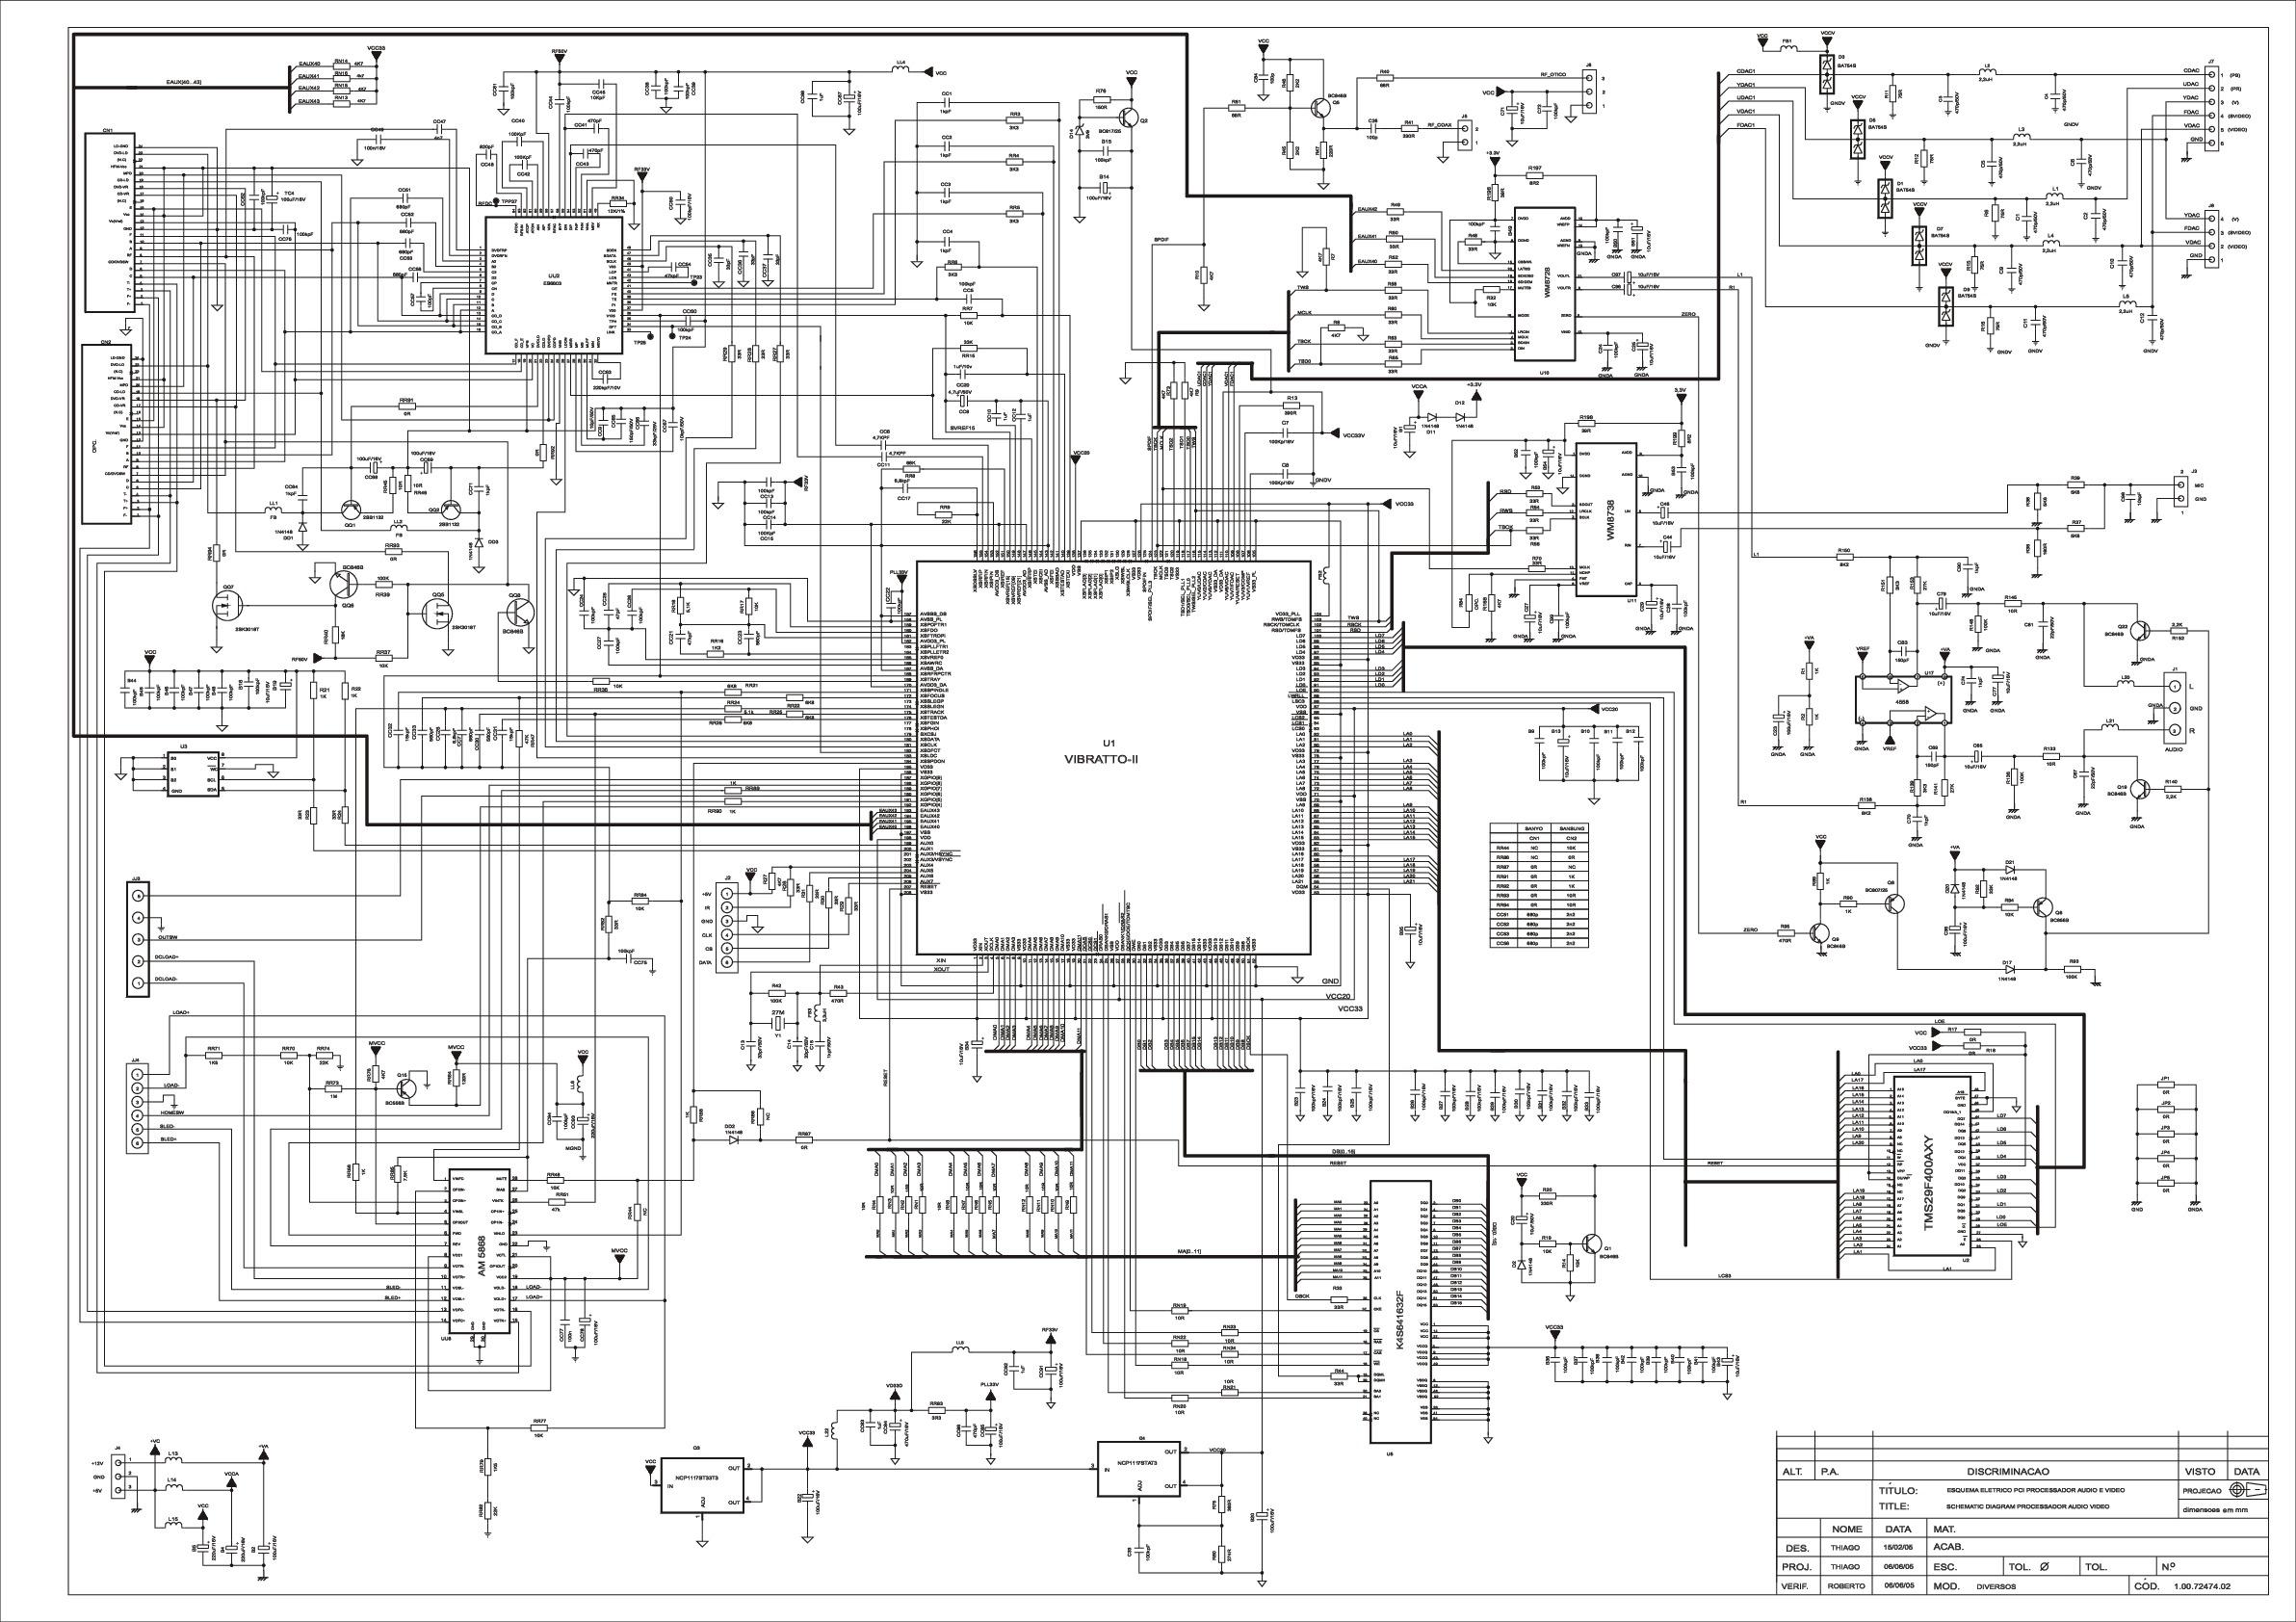 CCE DVD-5200 Diagrama Esquematico.pdf